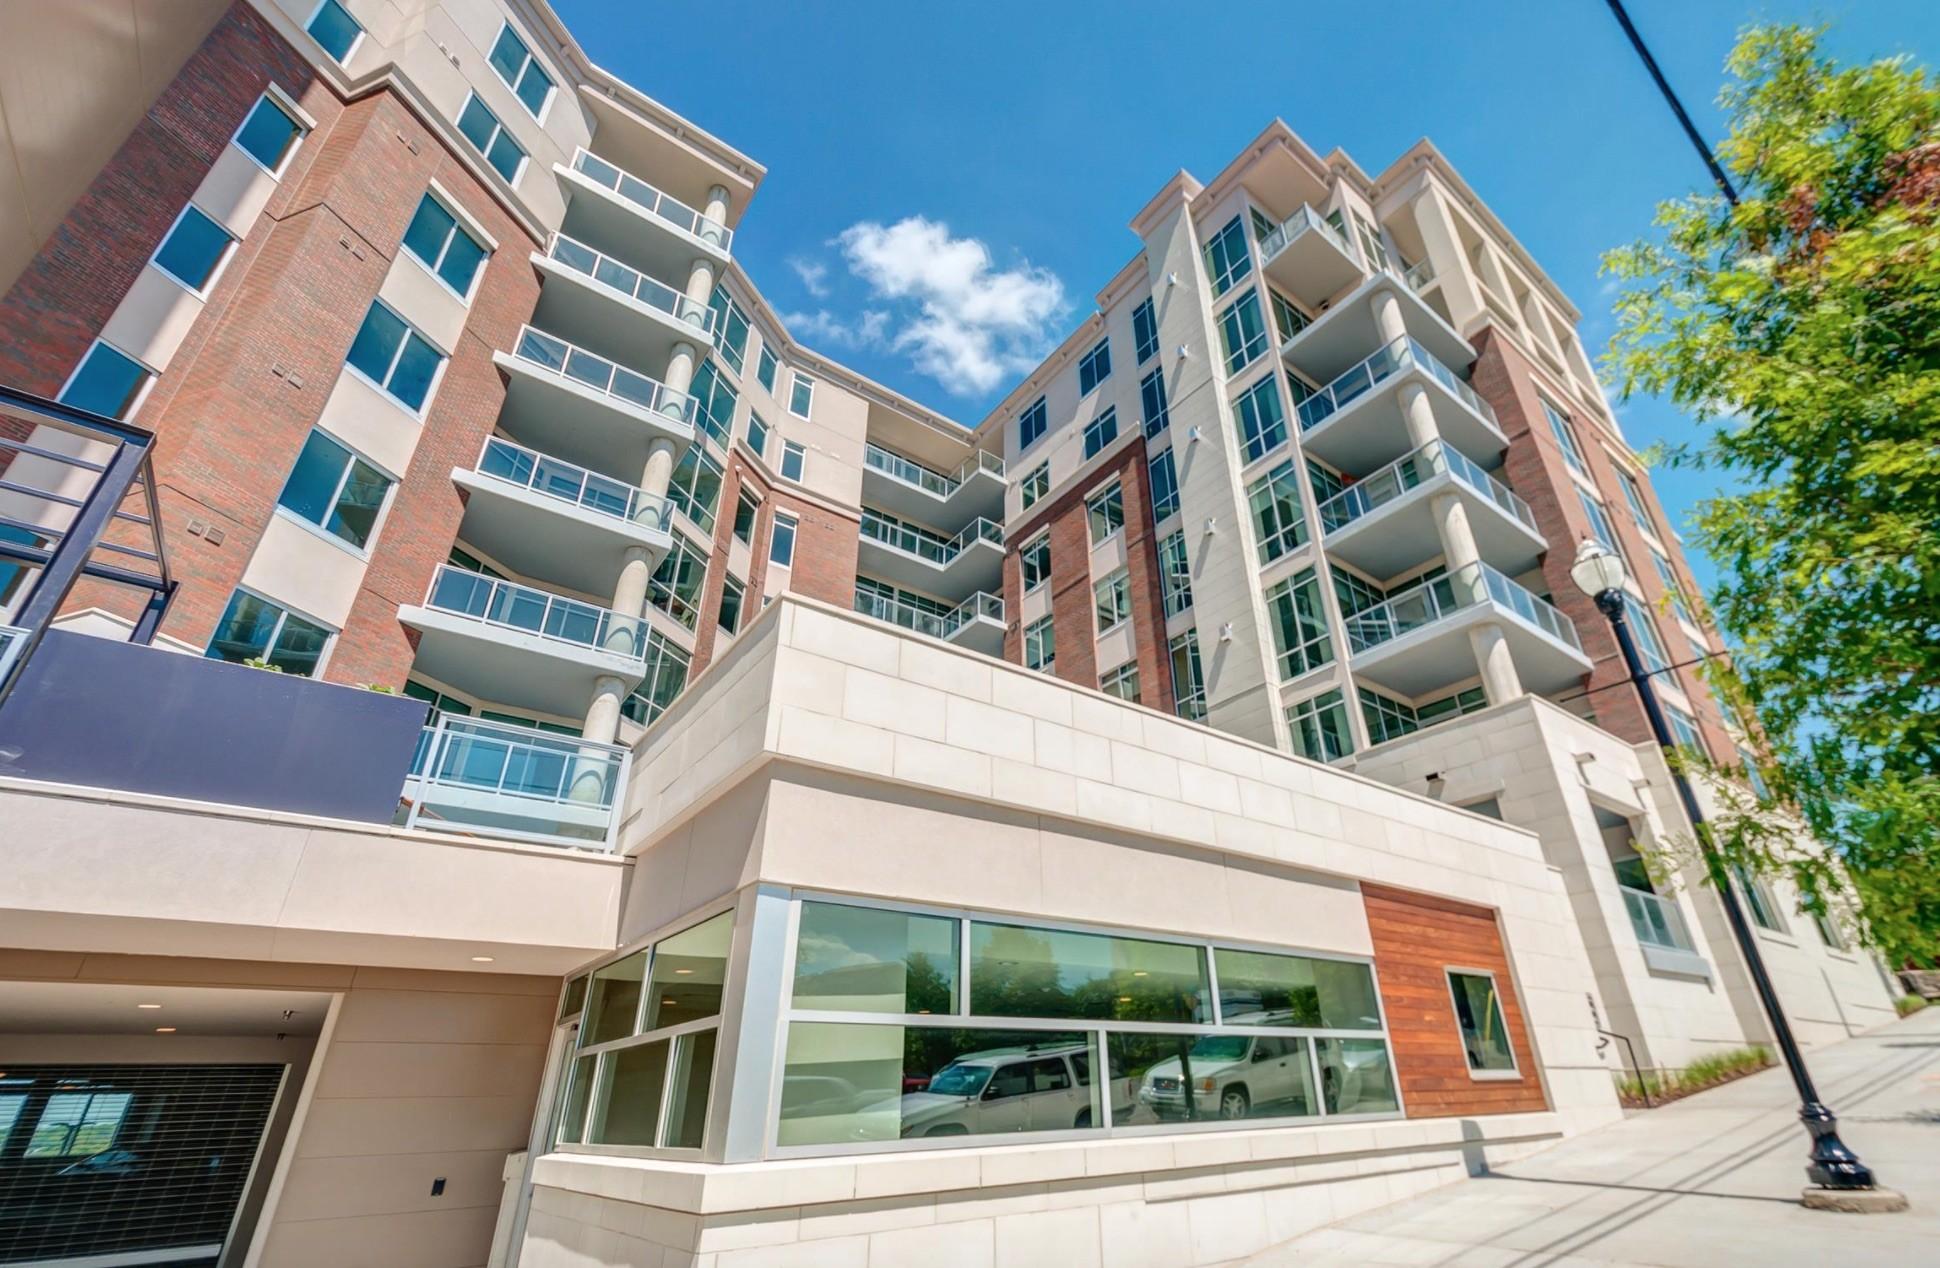 20 Rutledge St #411, Nashville, TN 37210 - Nashville, TN real estate listing